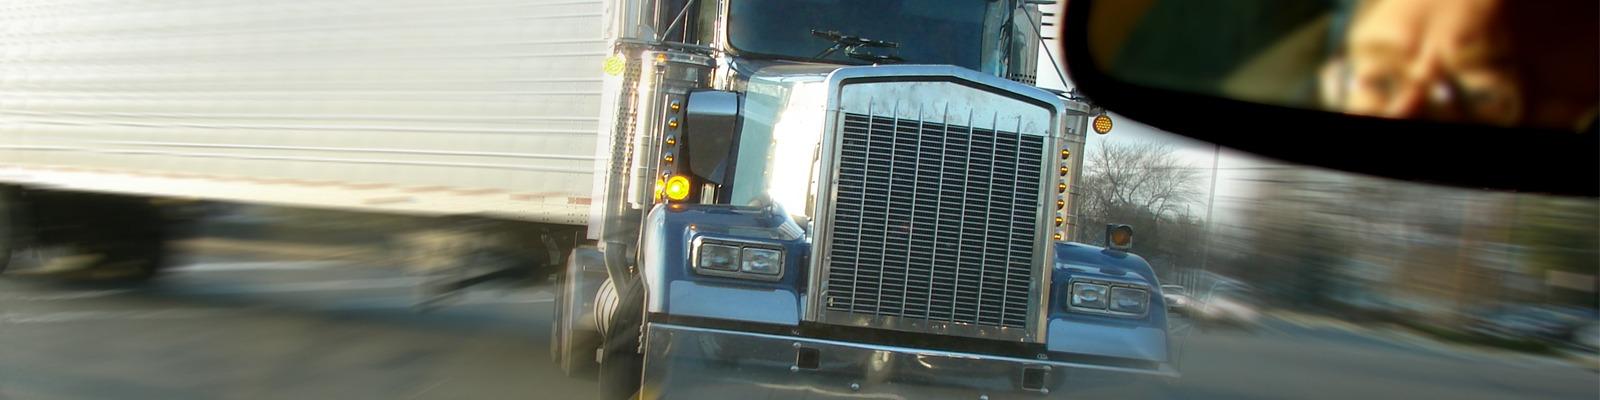 Truck Driver Workplace Fatalities Skyrocket